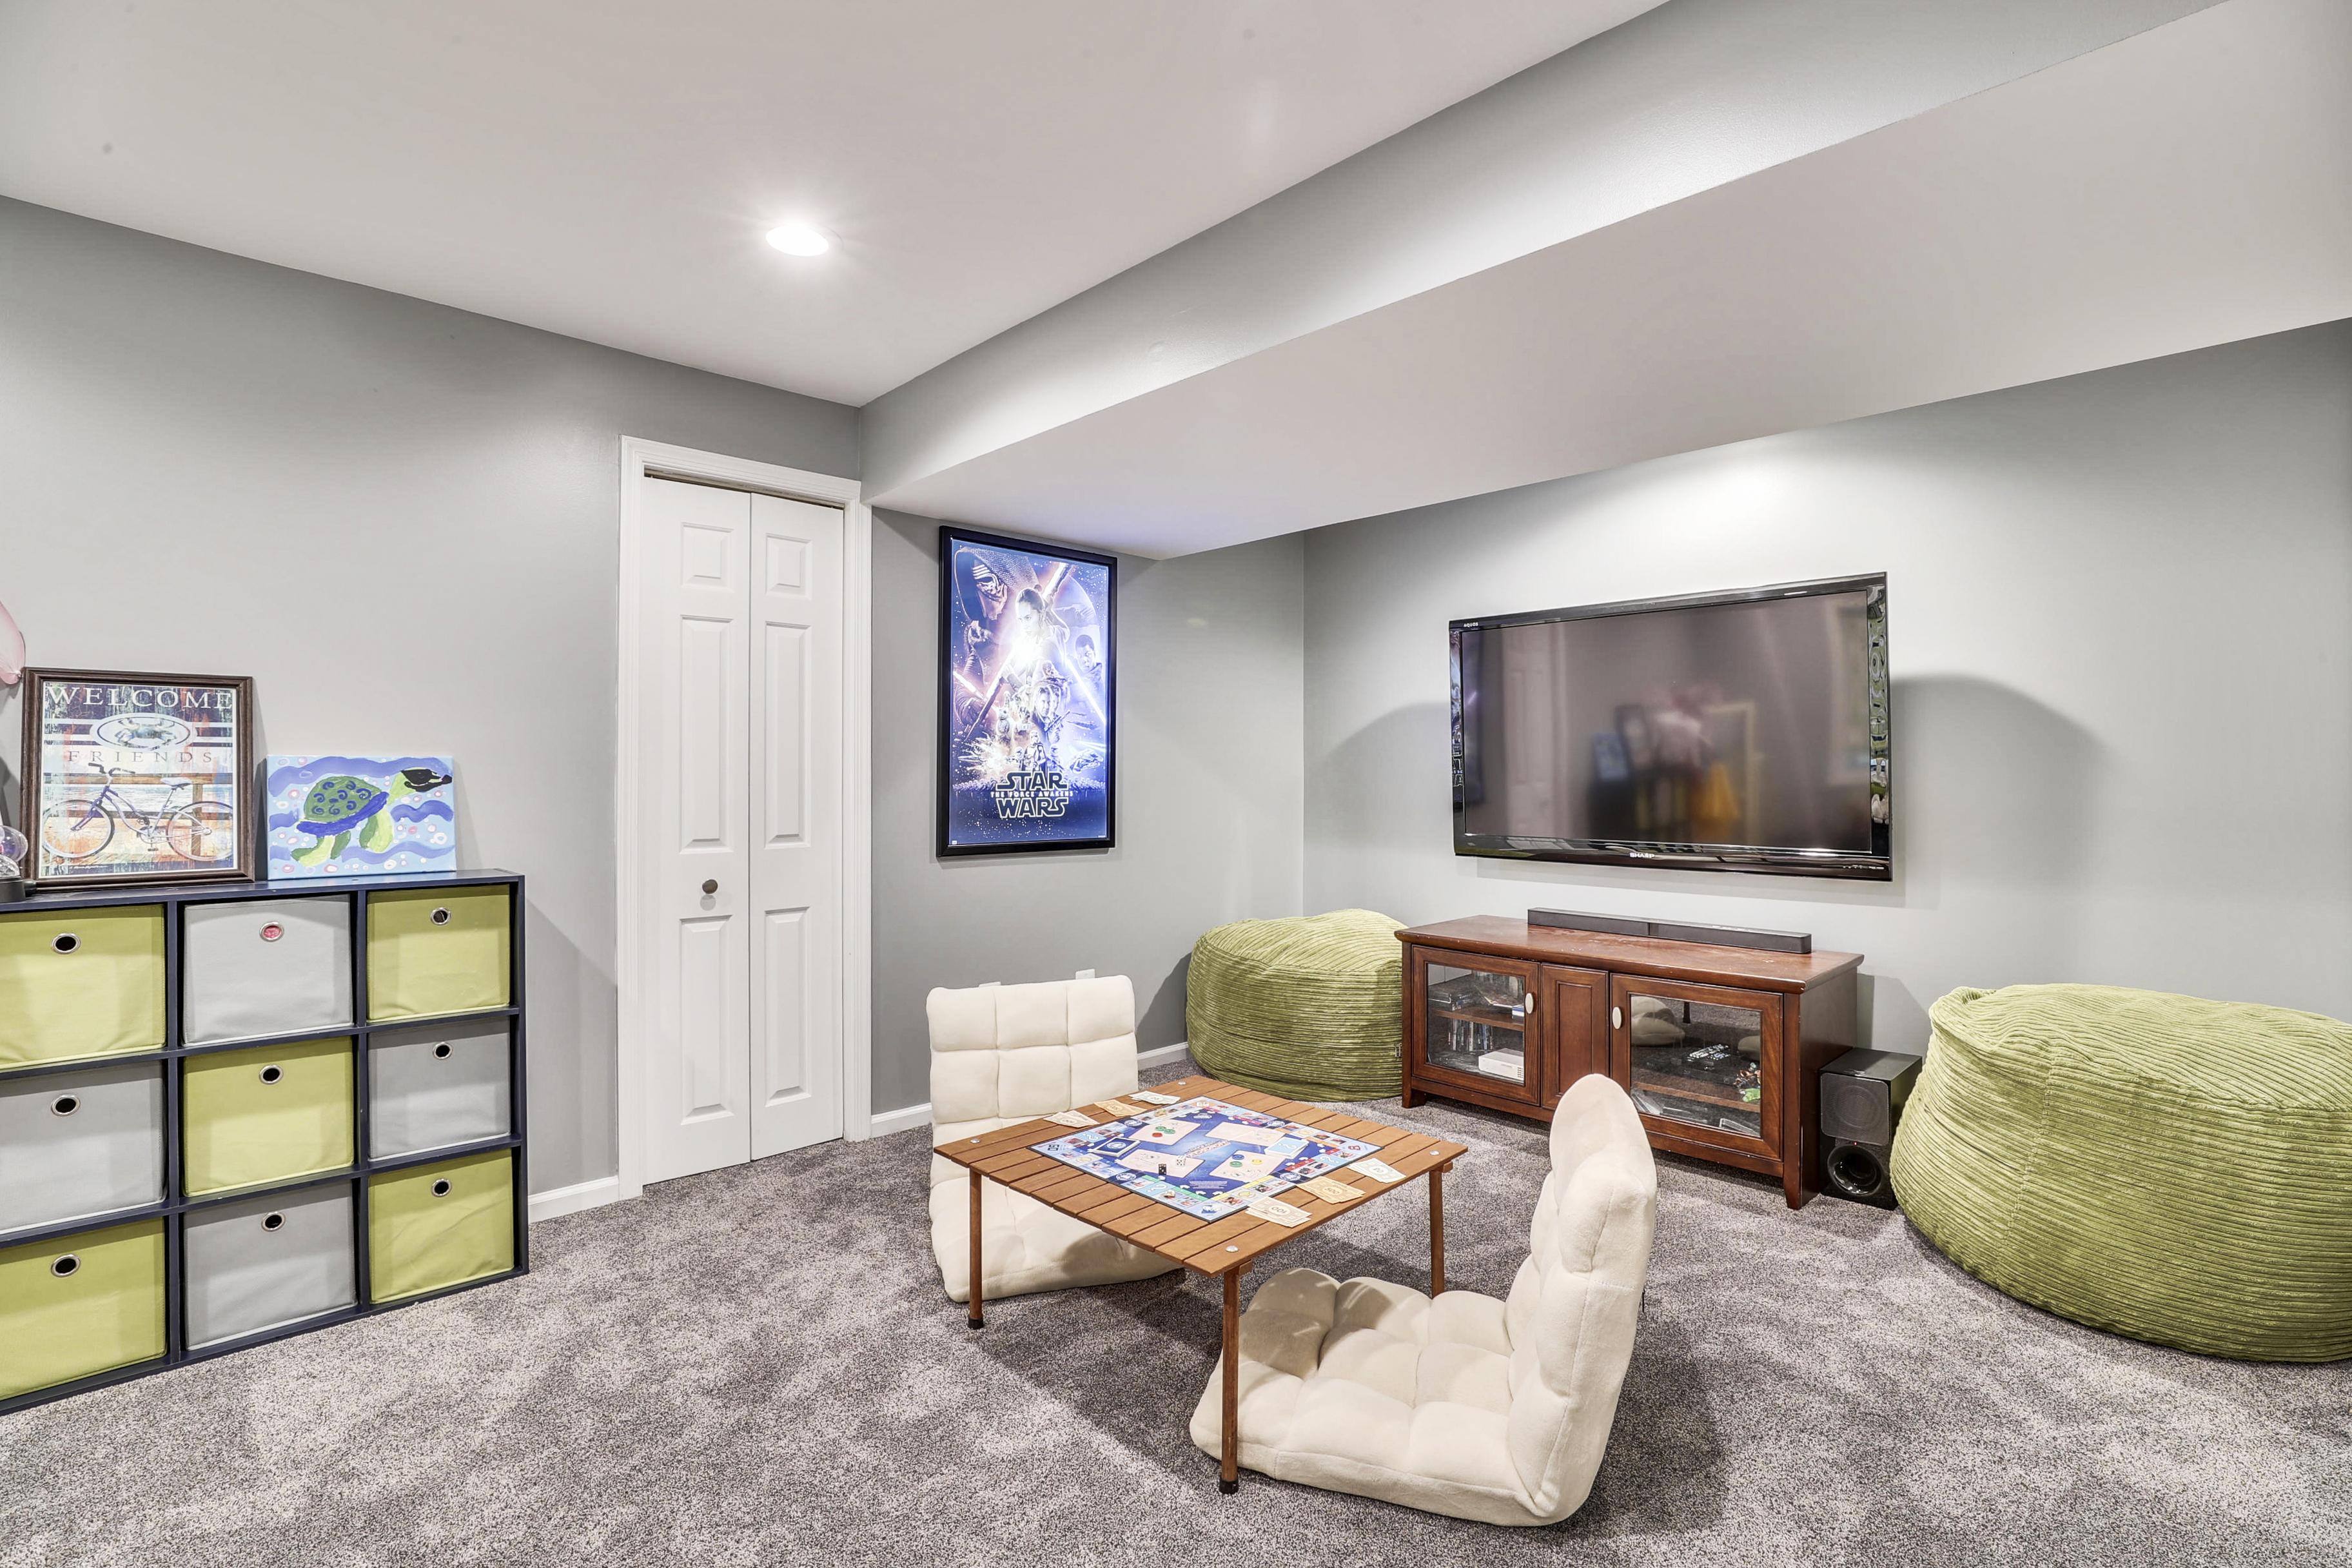 Interior-Recreation Room-12I6882